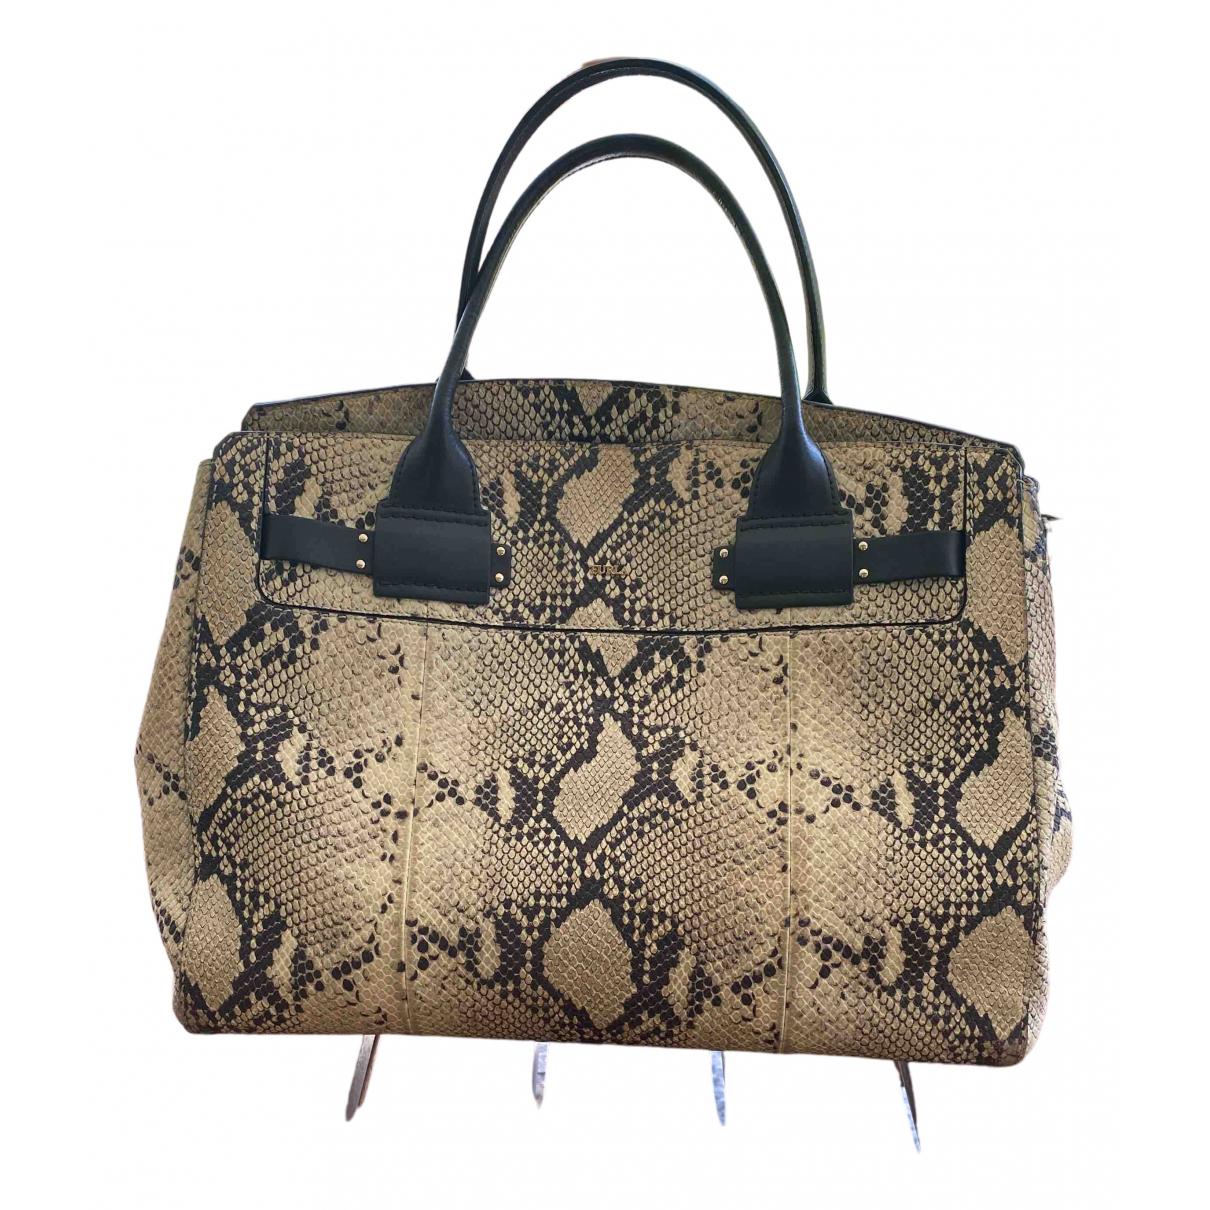 Furla \N Multicolour Leather handbag for Women \N